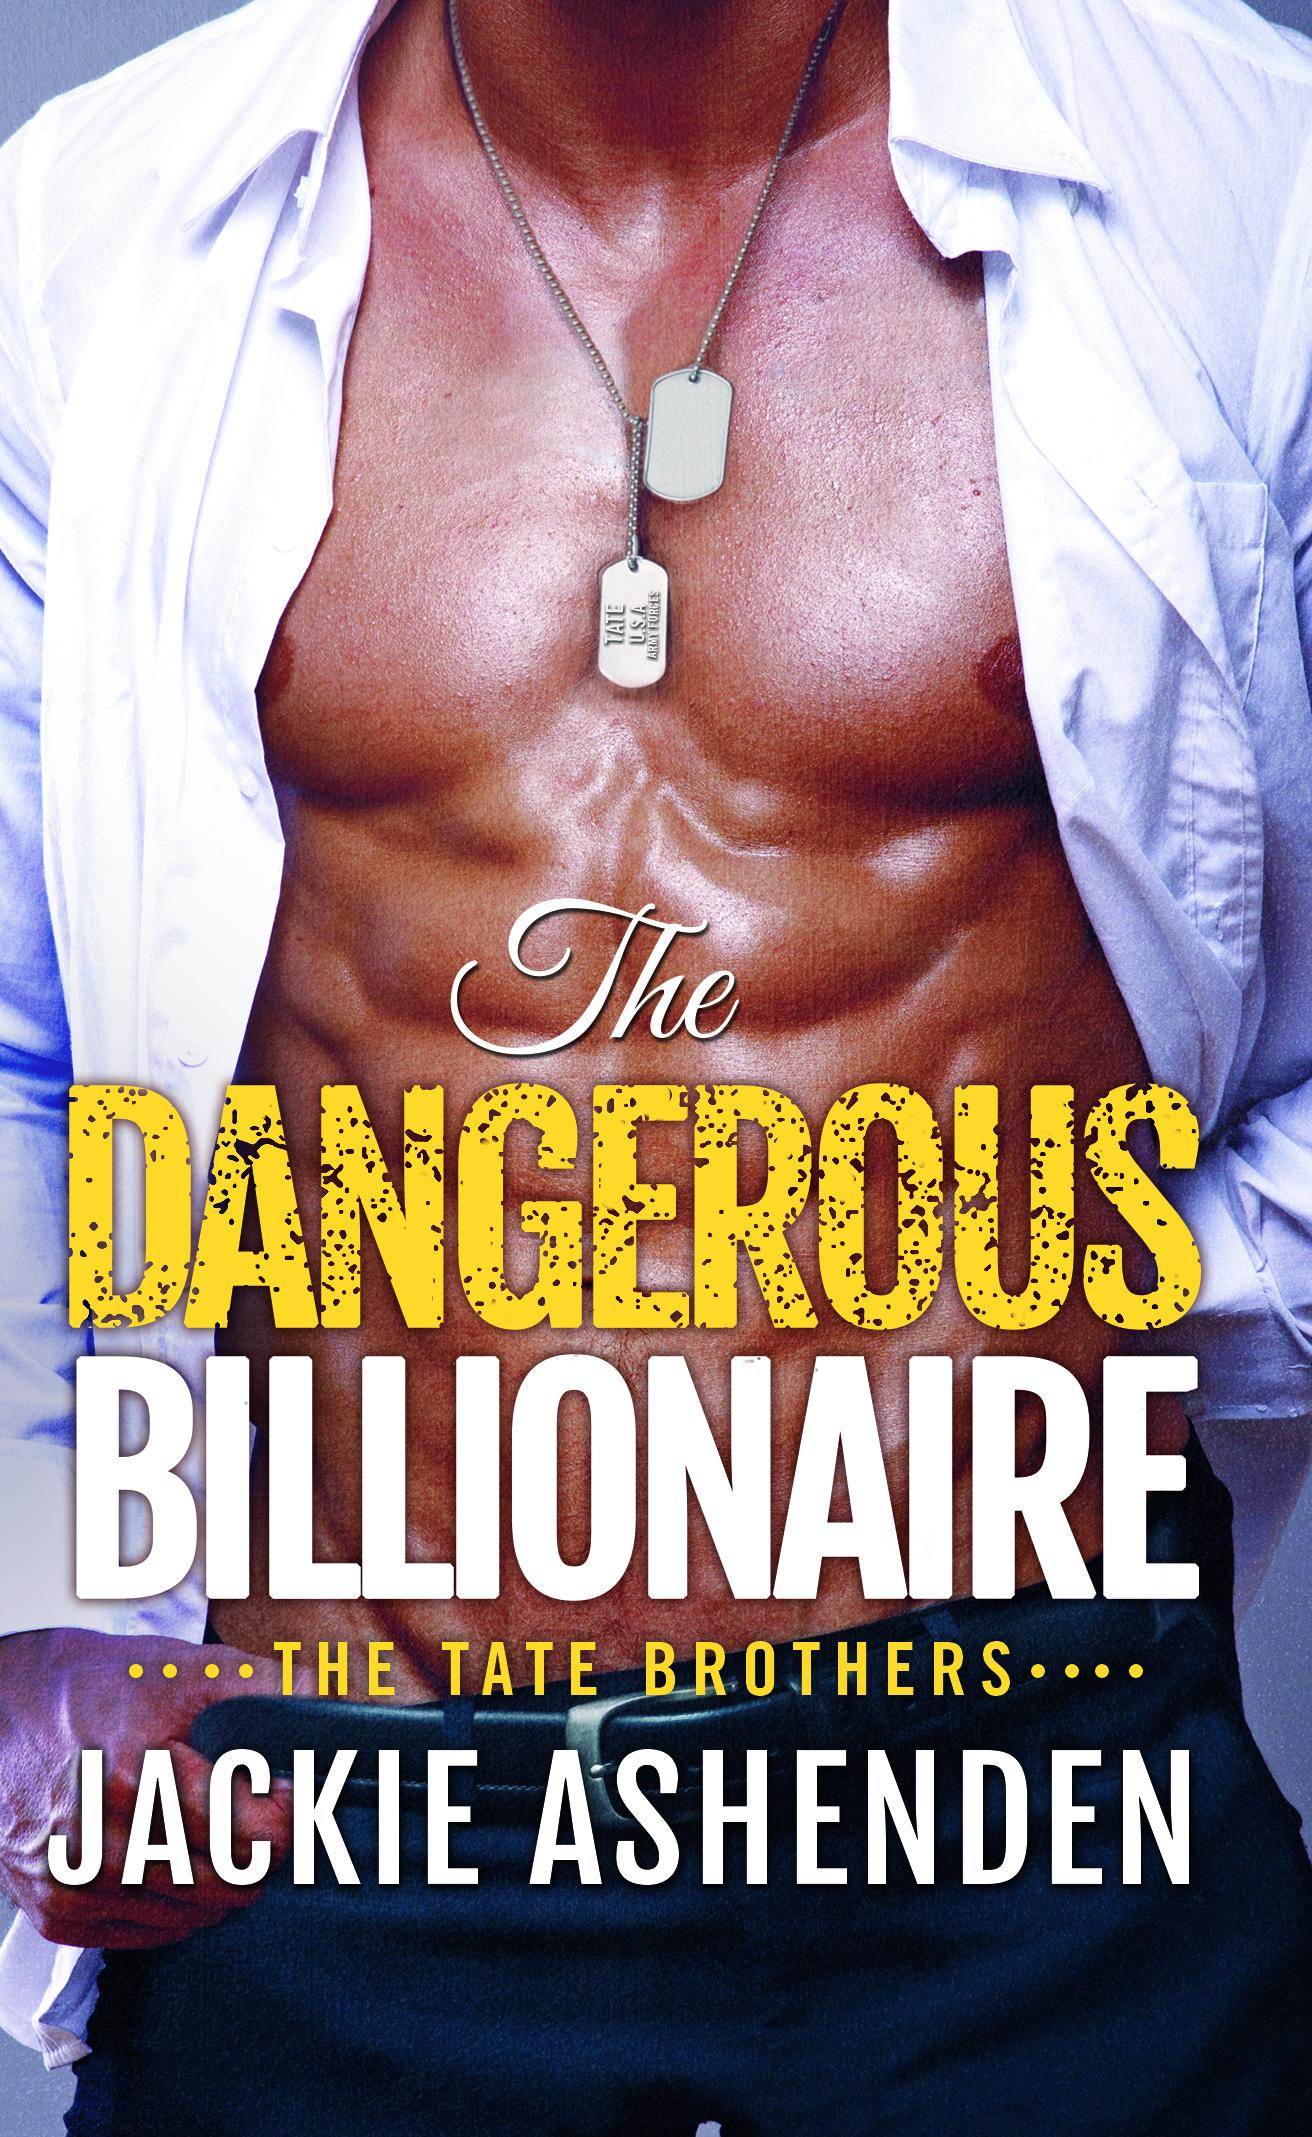 Review – The Dangerous Billionaire by Jackie Ashenden